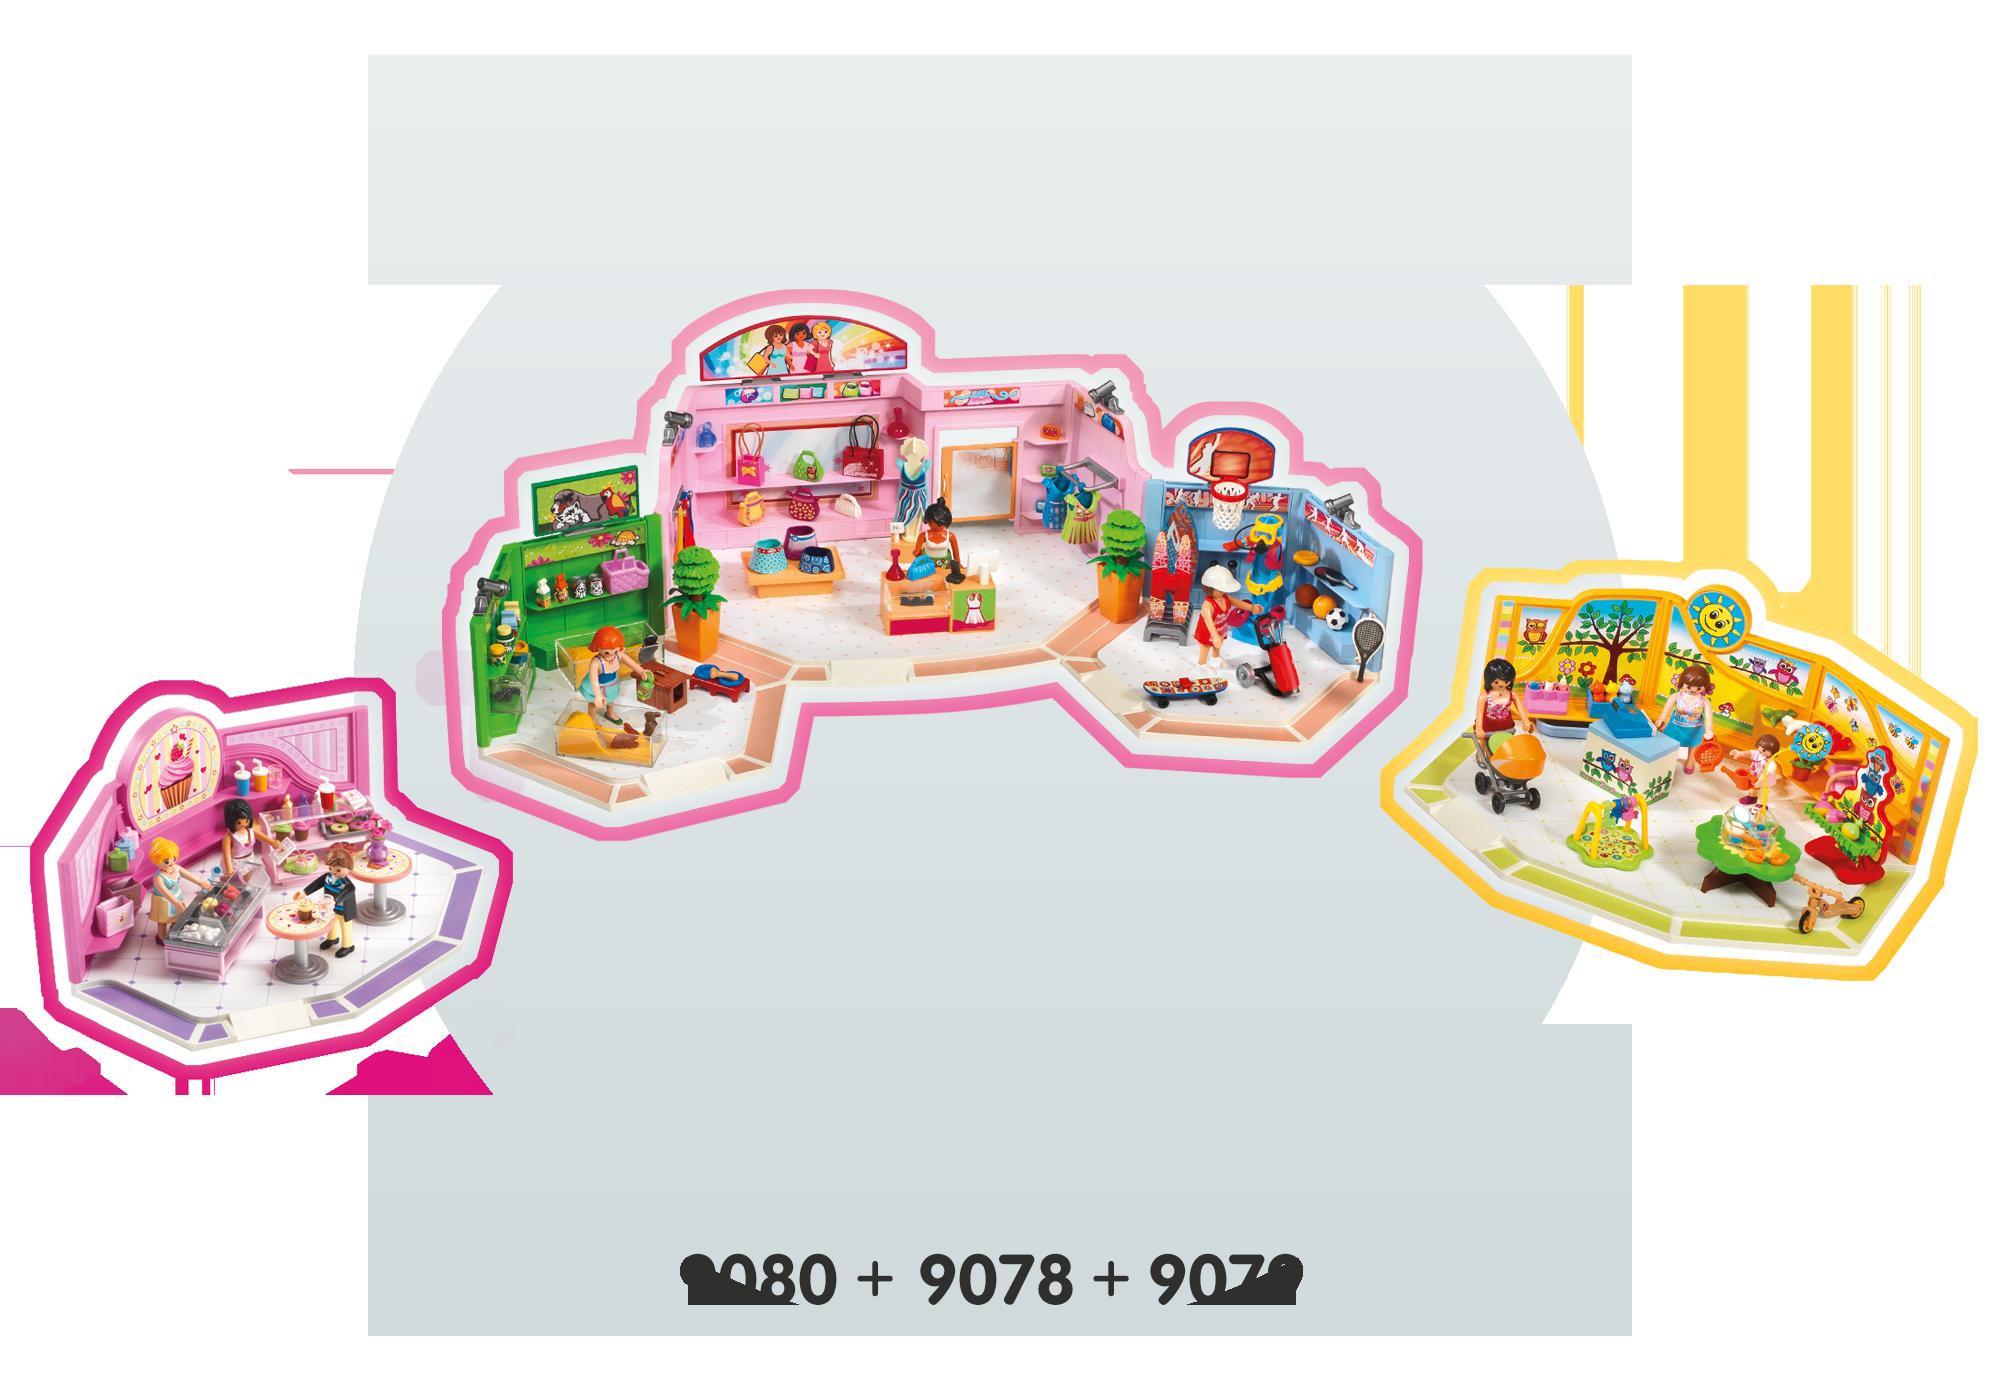 http://media.playmobil.com/i/playmobil/9078_product_extra5/Galleria con 3 negozi